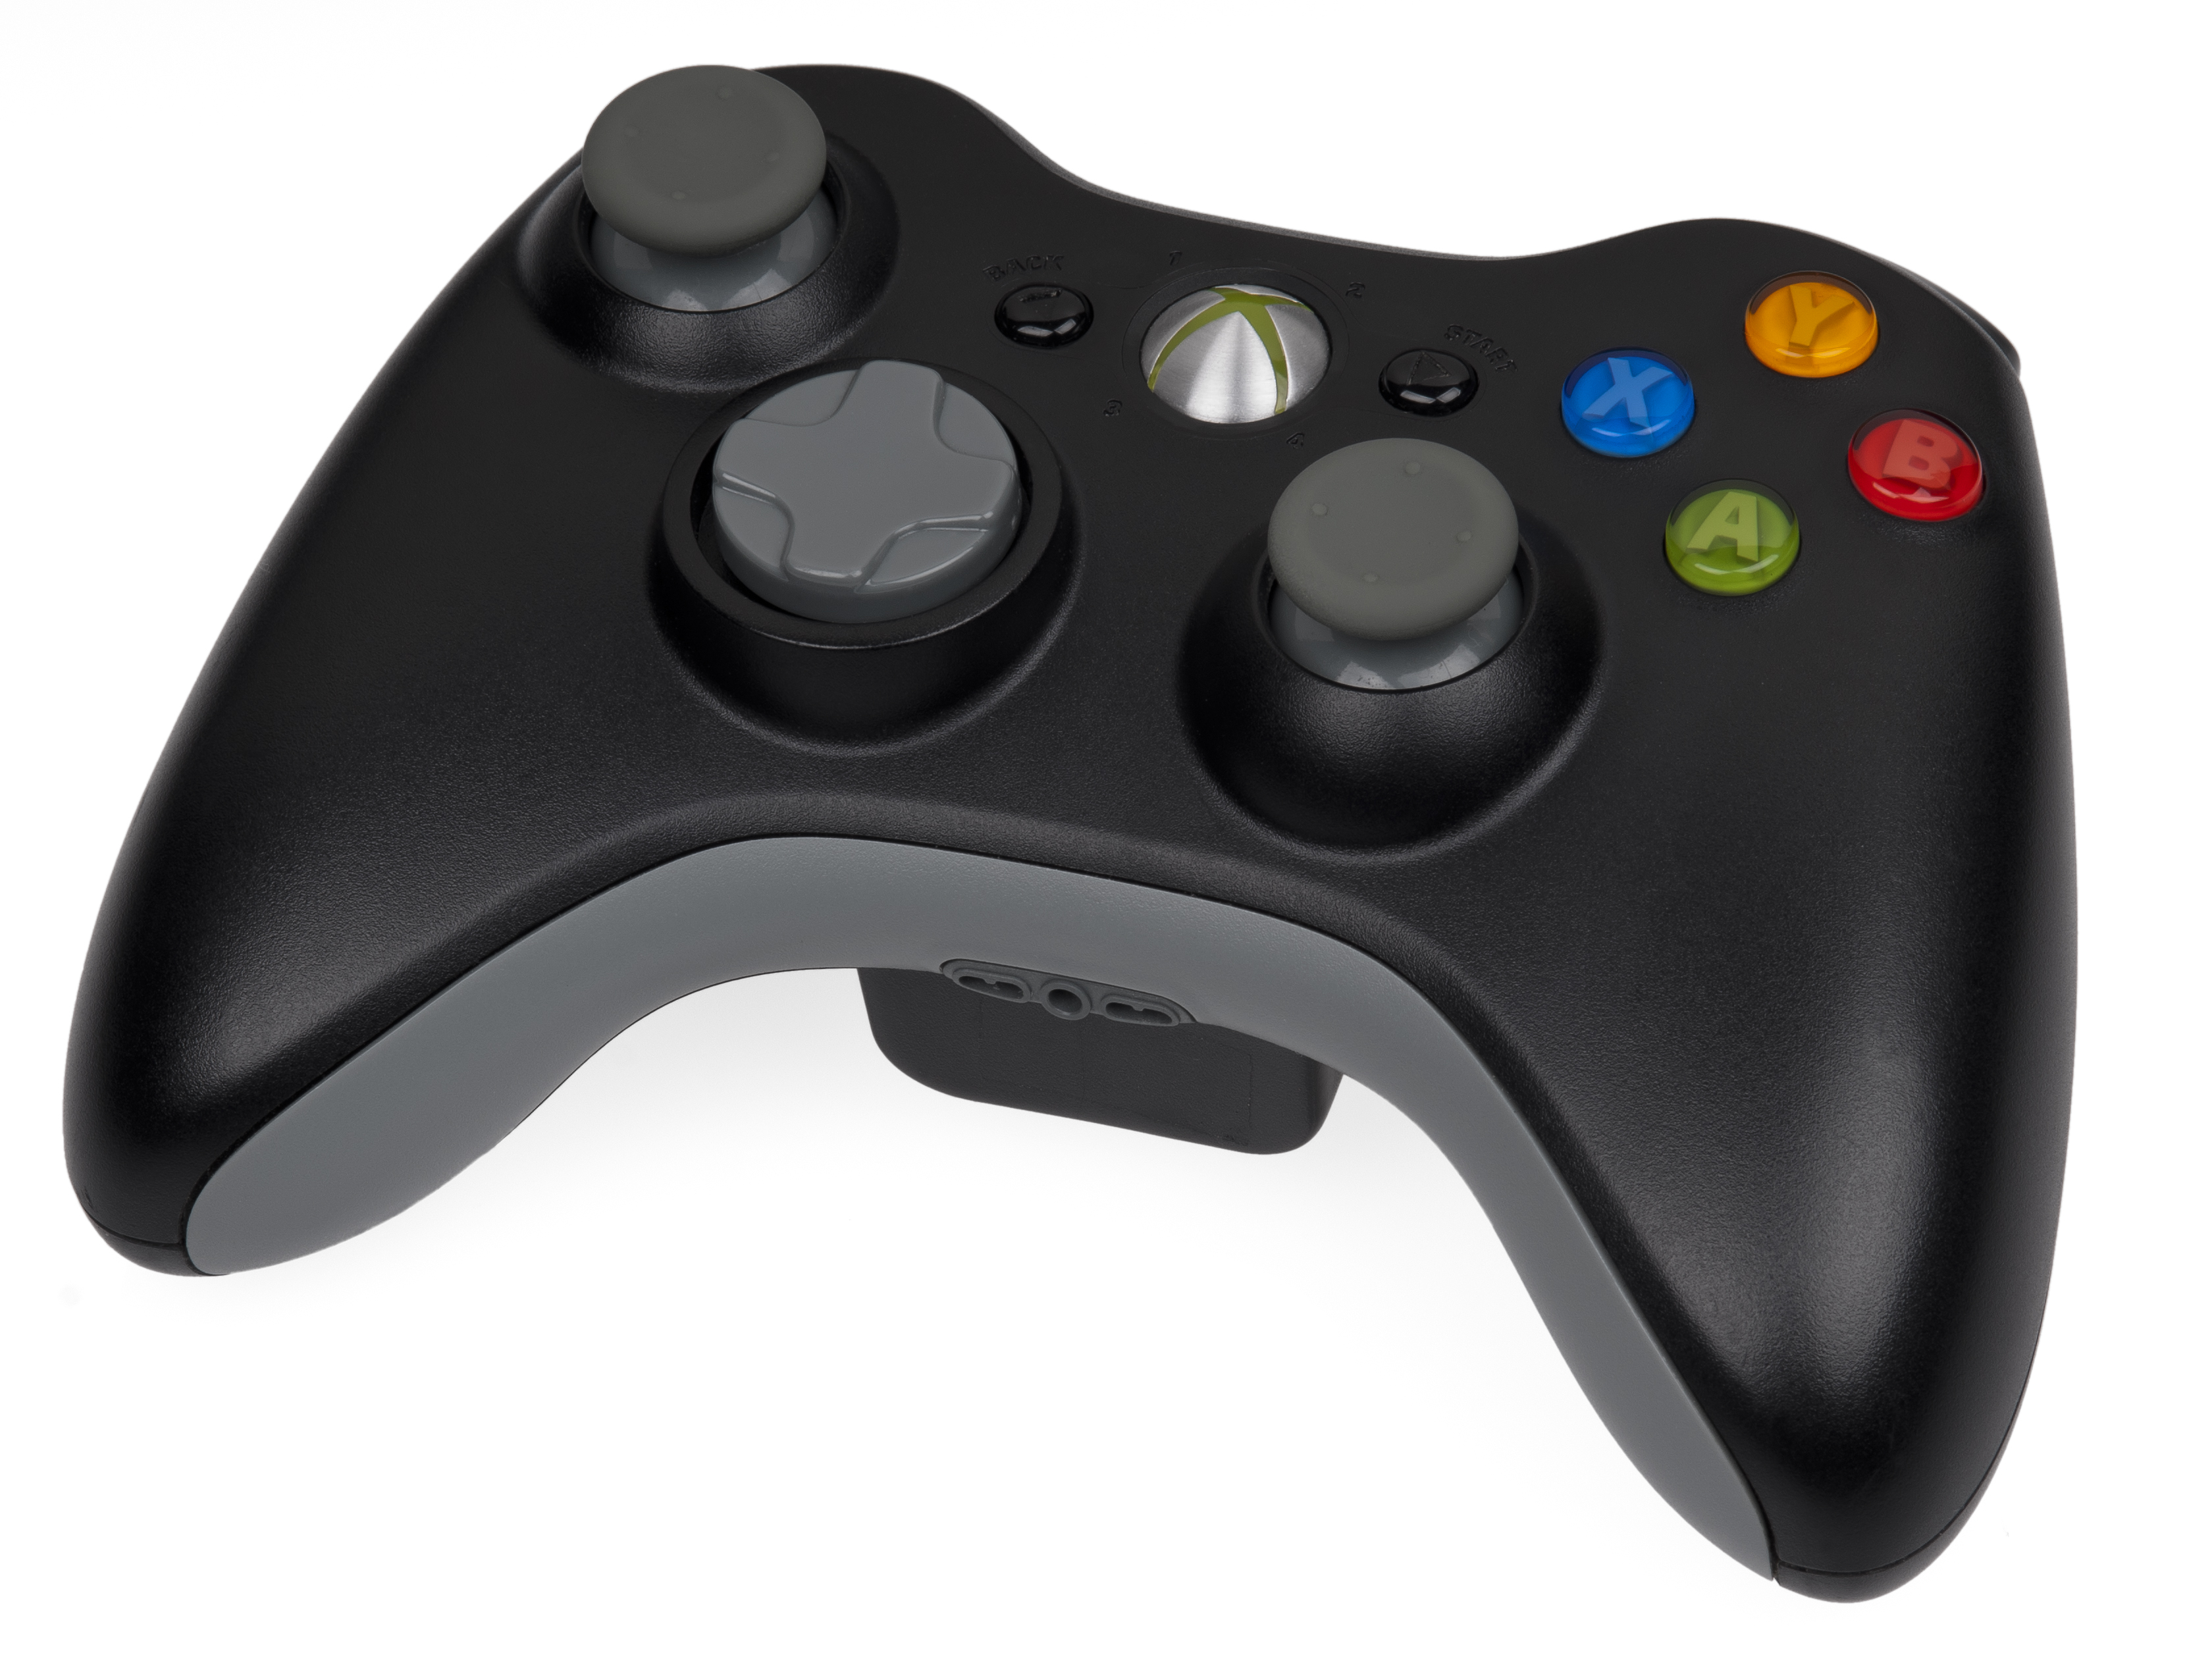 xbox 360 control: